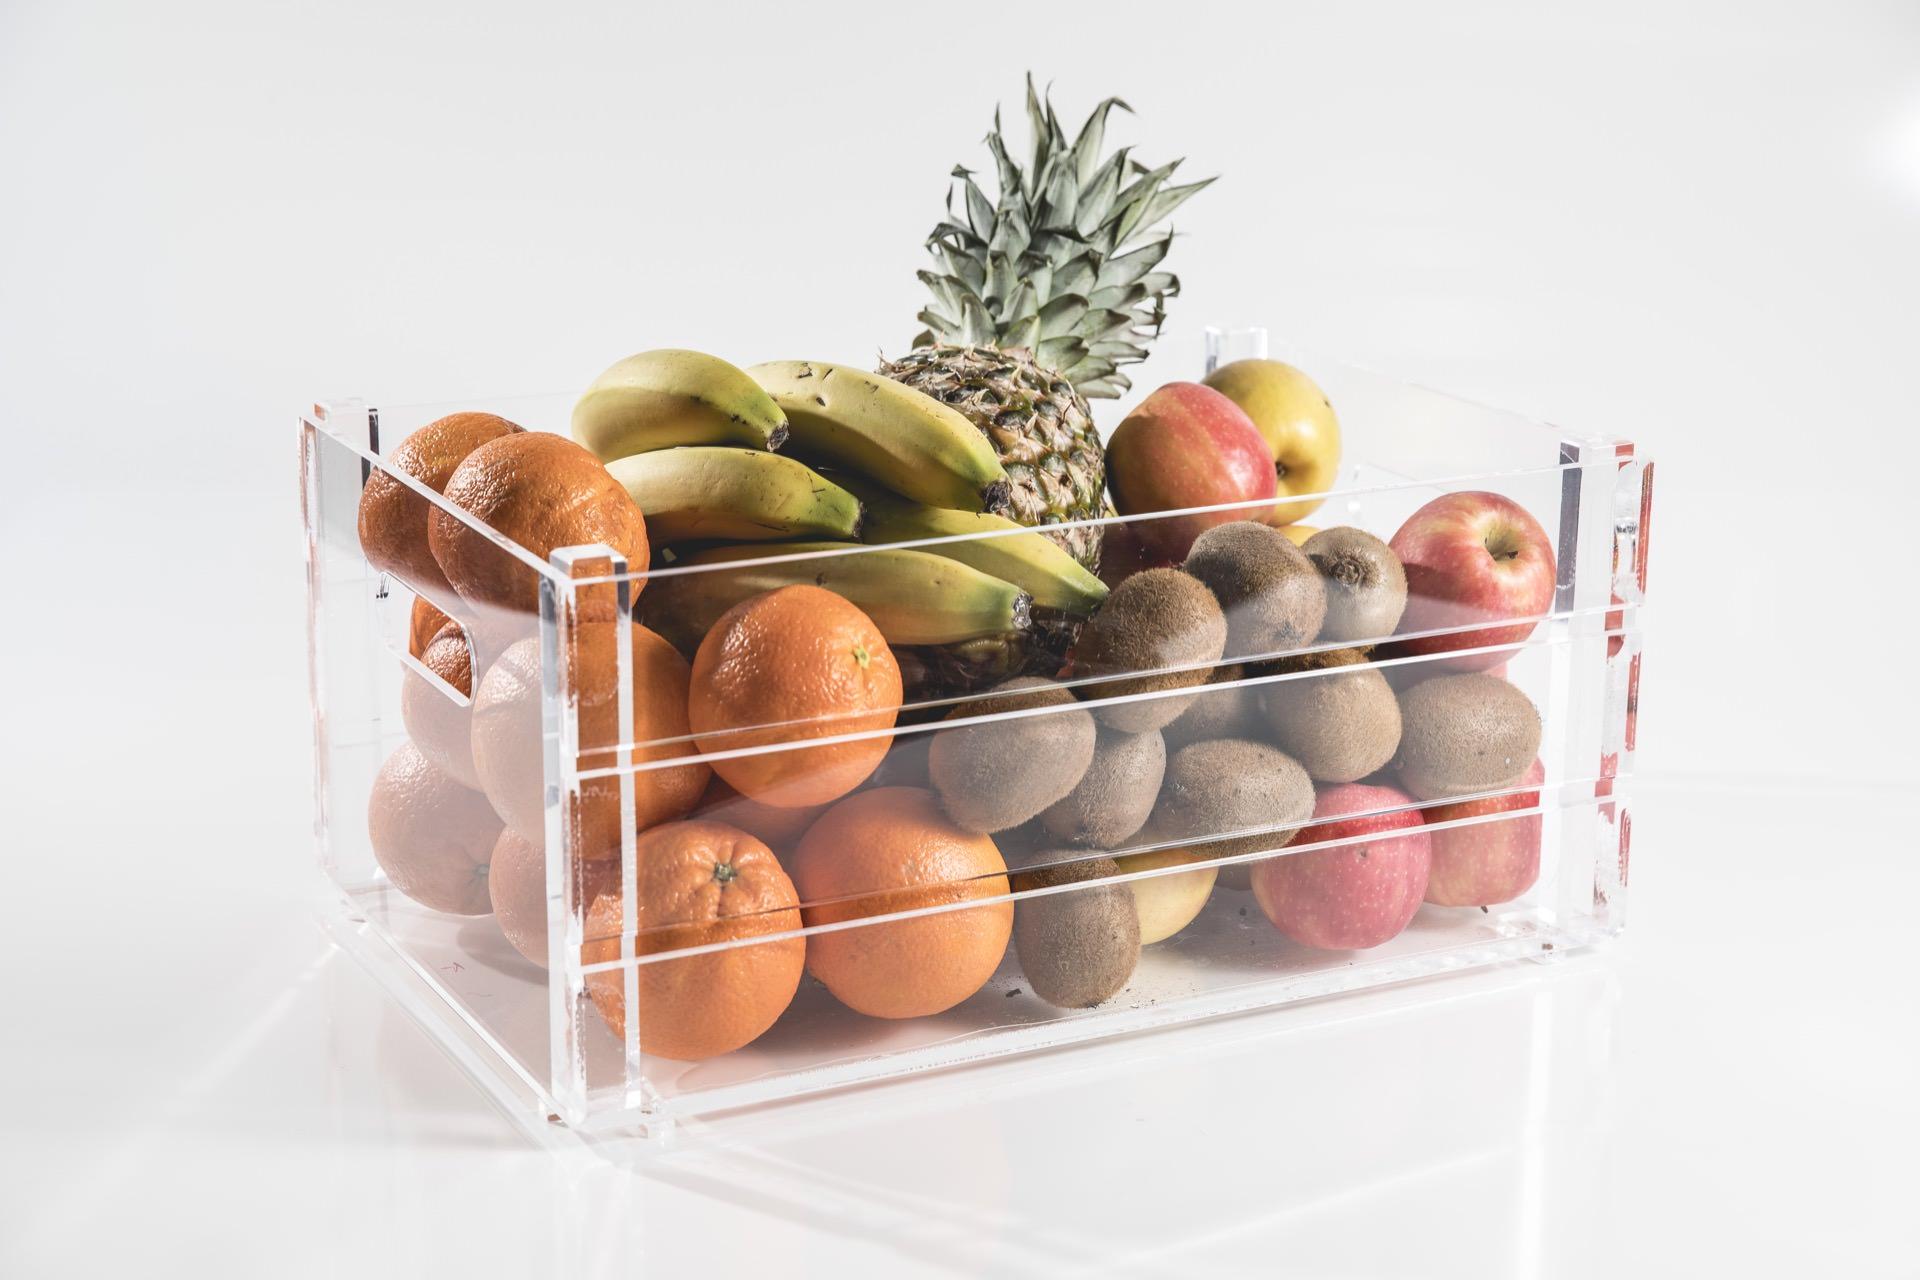 cassette-per-frutta-plexiglas